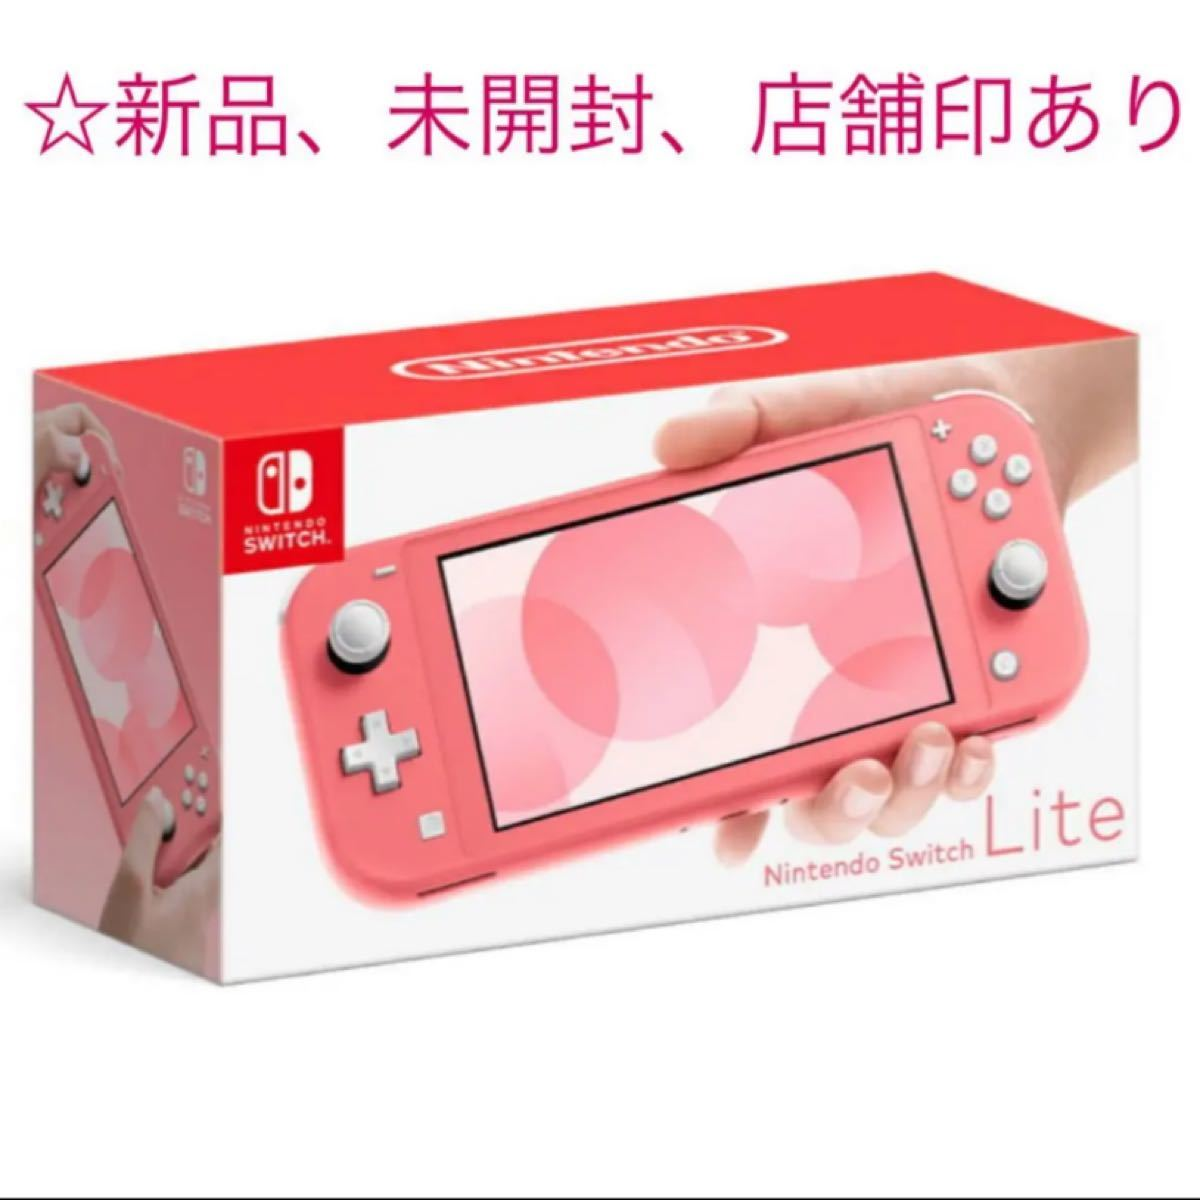 Nintendo Switch スイッチ ライト コーラル ピンク